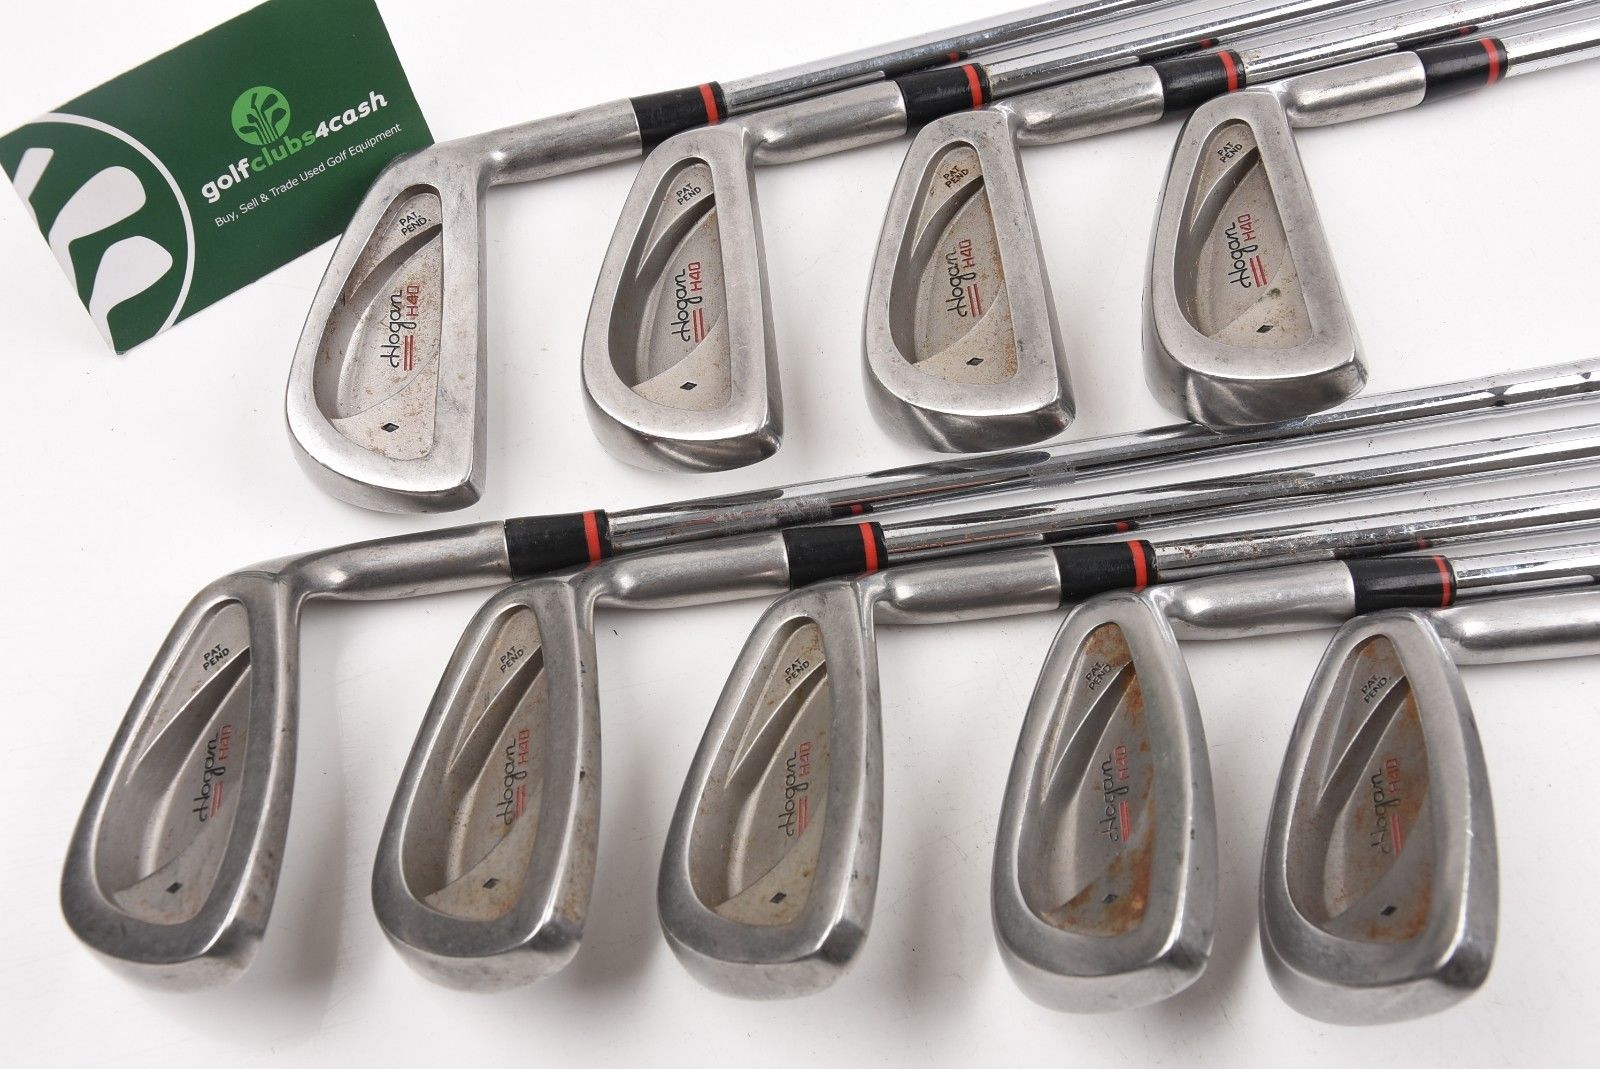 hogan golf clubs